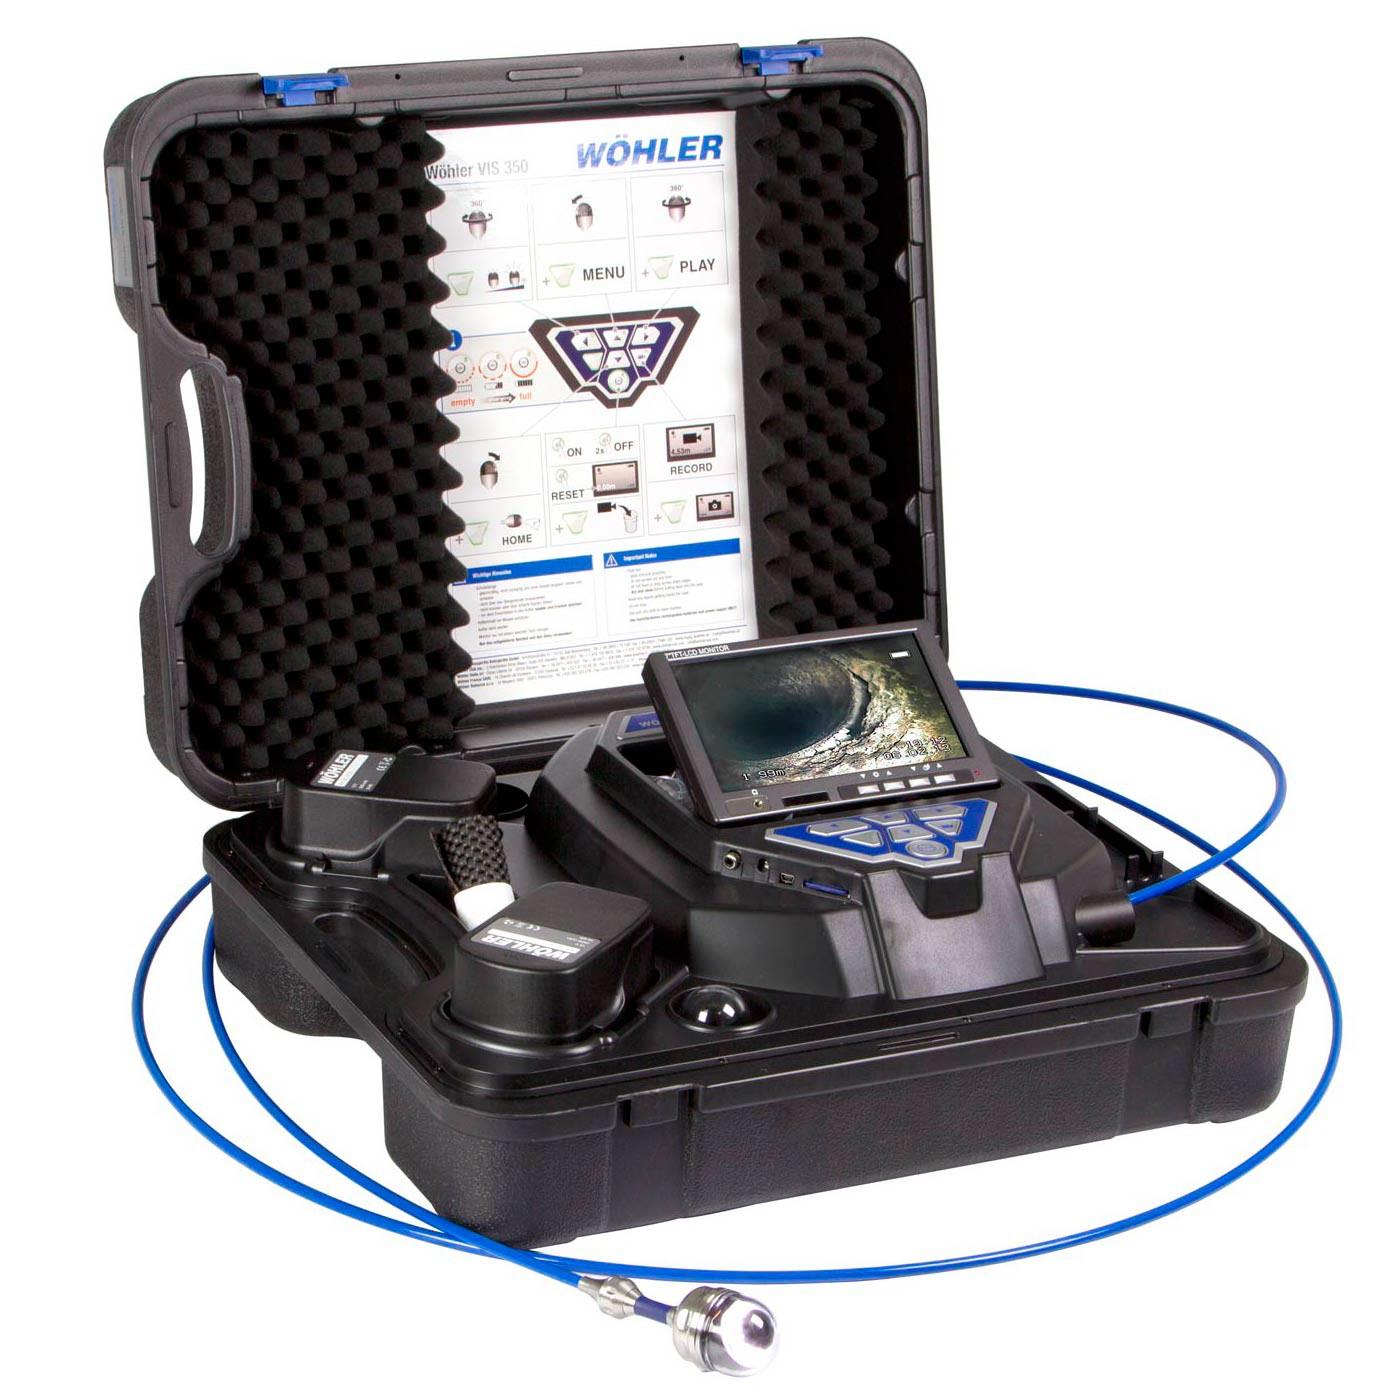 telecamera_videoispezione_usata_vendita